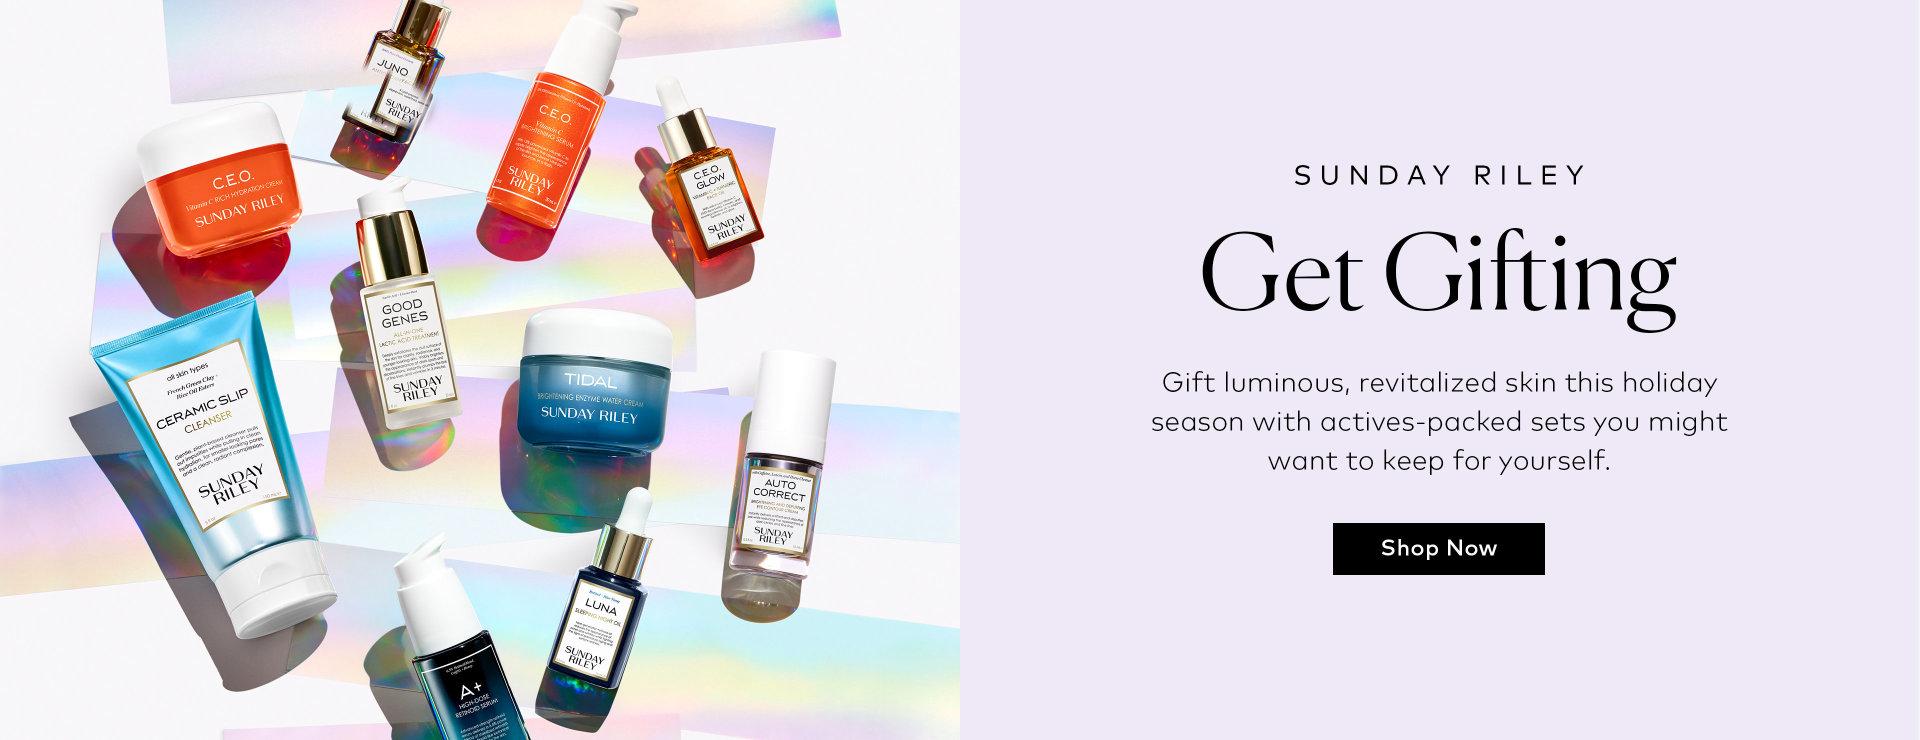 Shop Sunday Riley's 2019 Holiday Collection on Beautylish.com